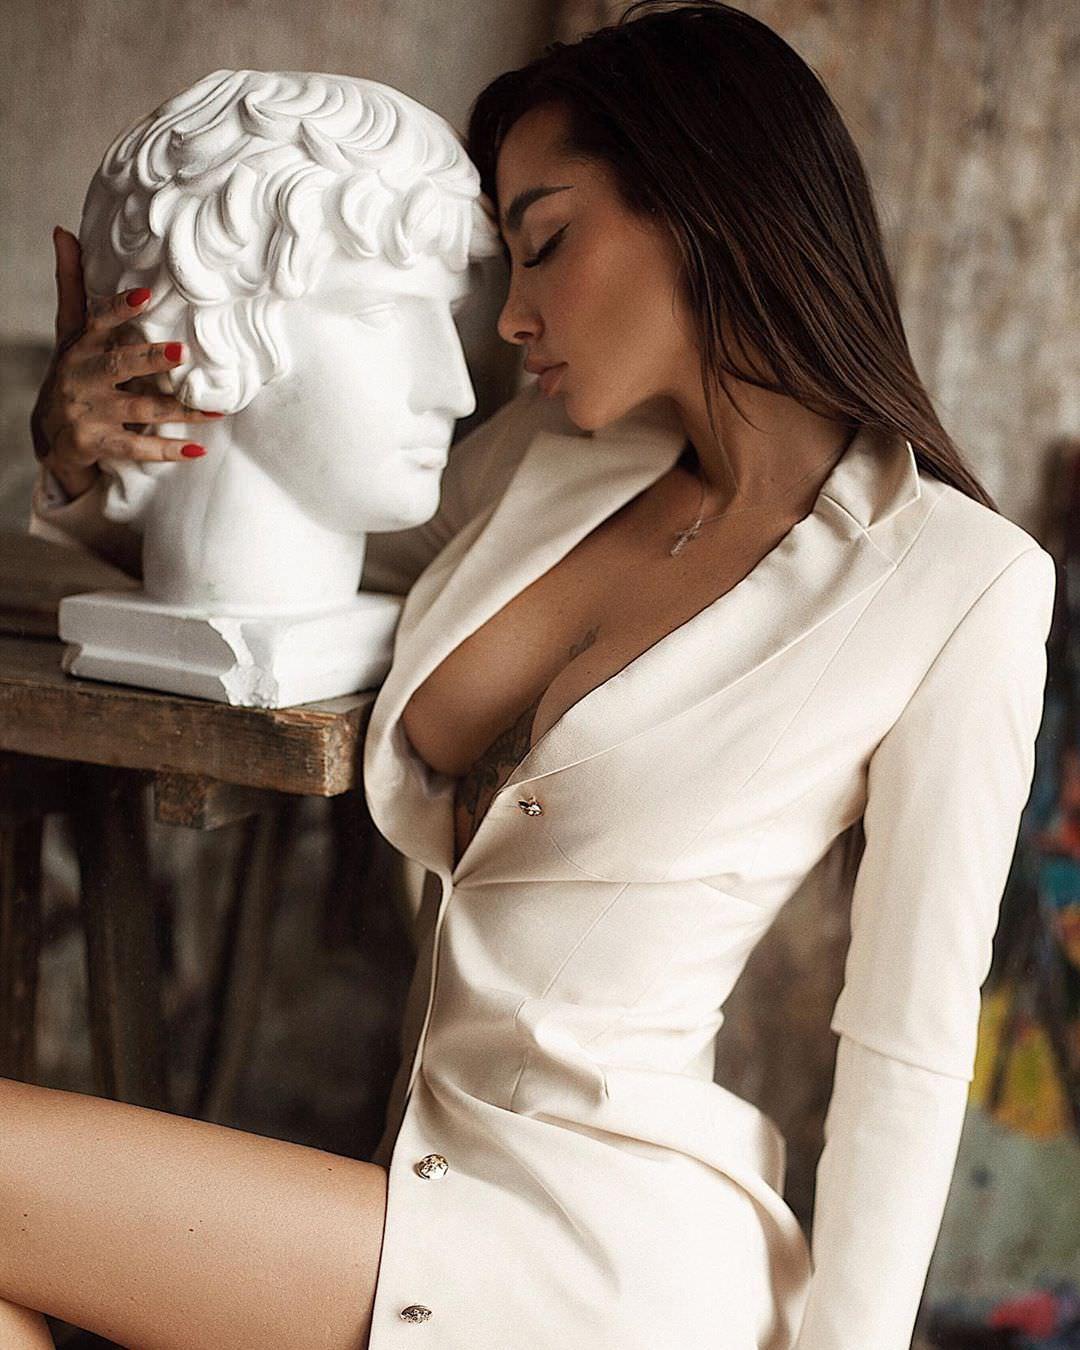 Анжелика Андерсон фото в пиджаке